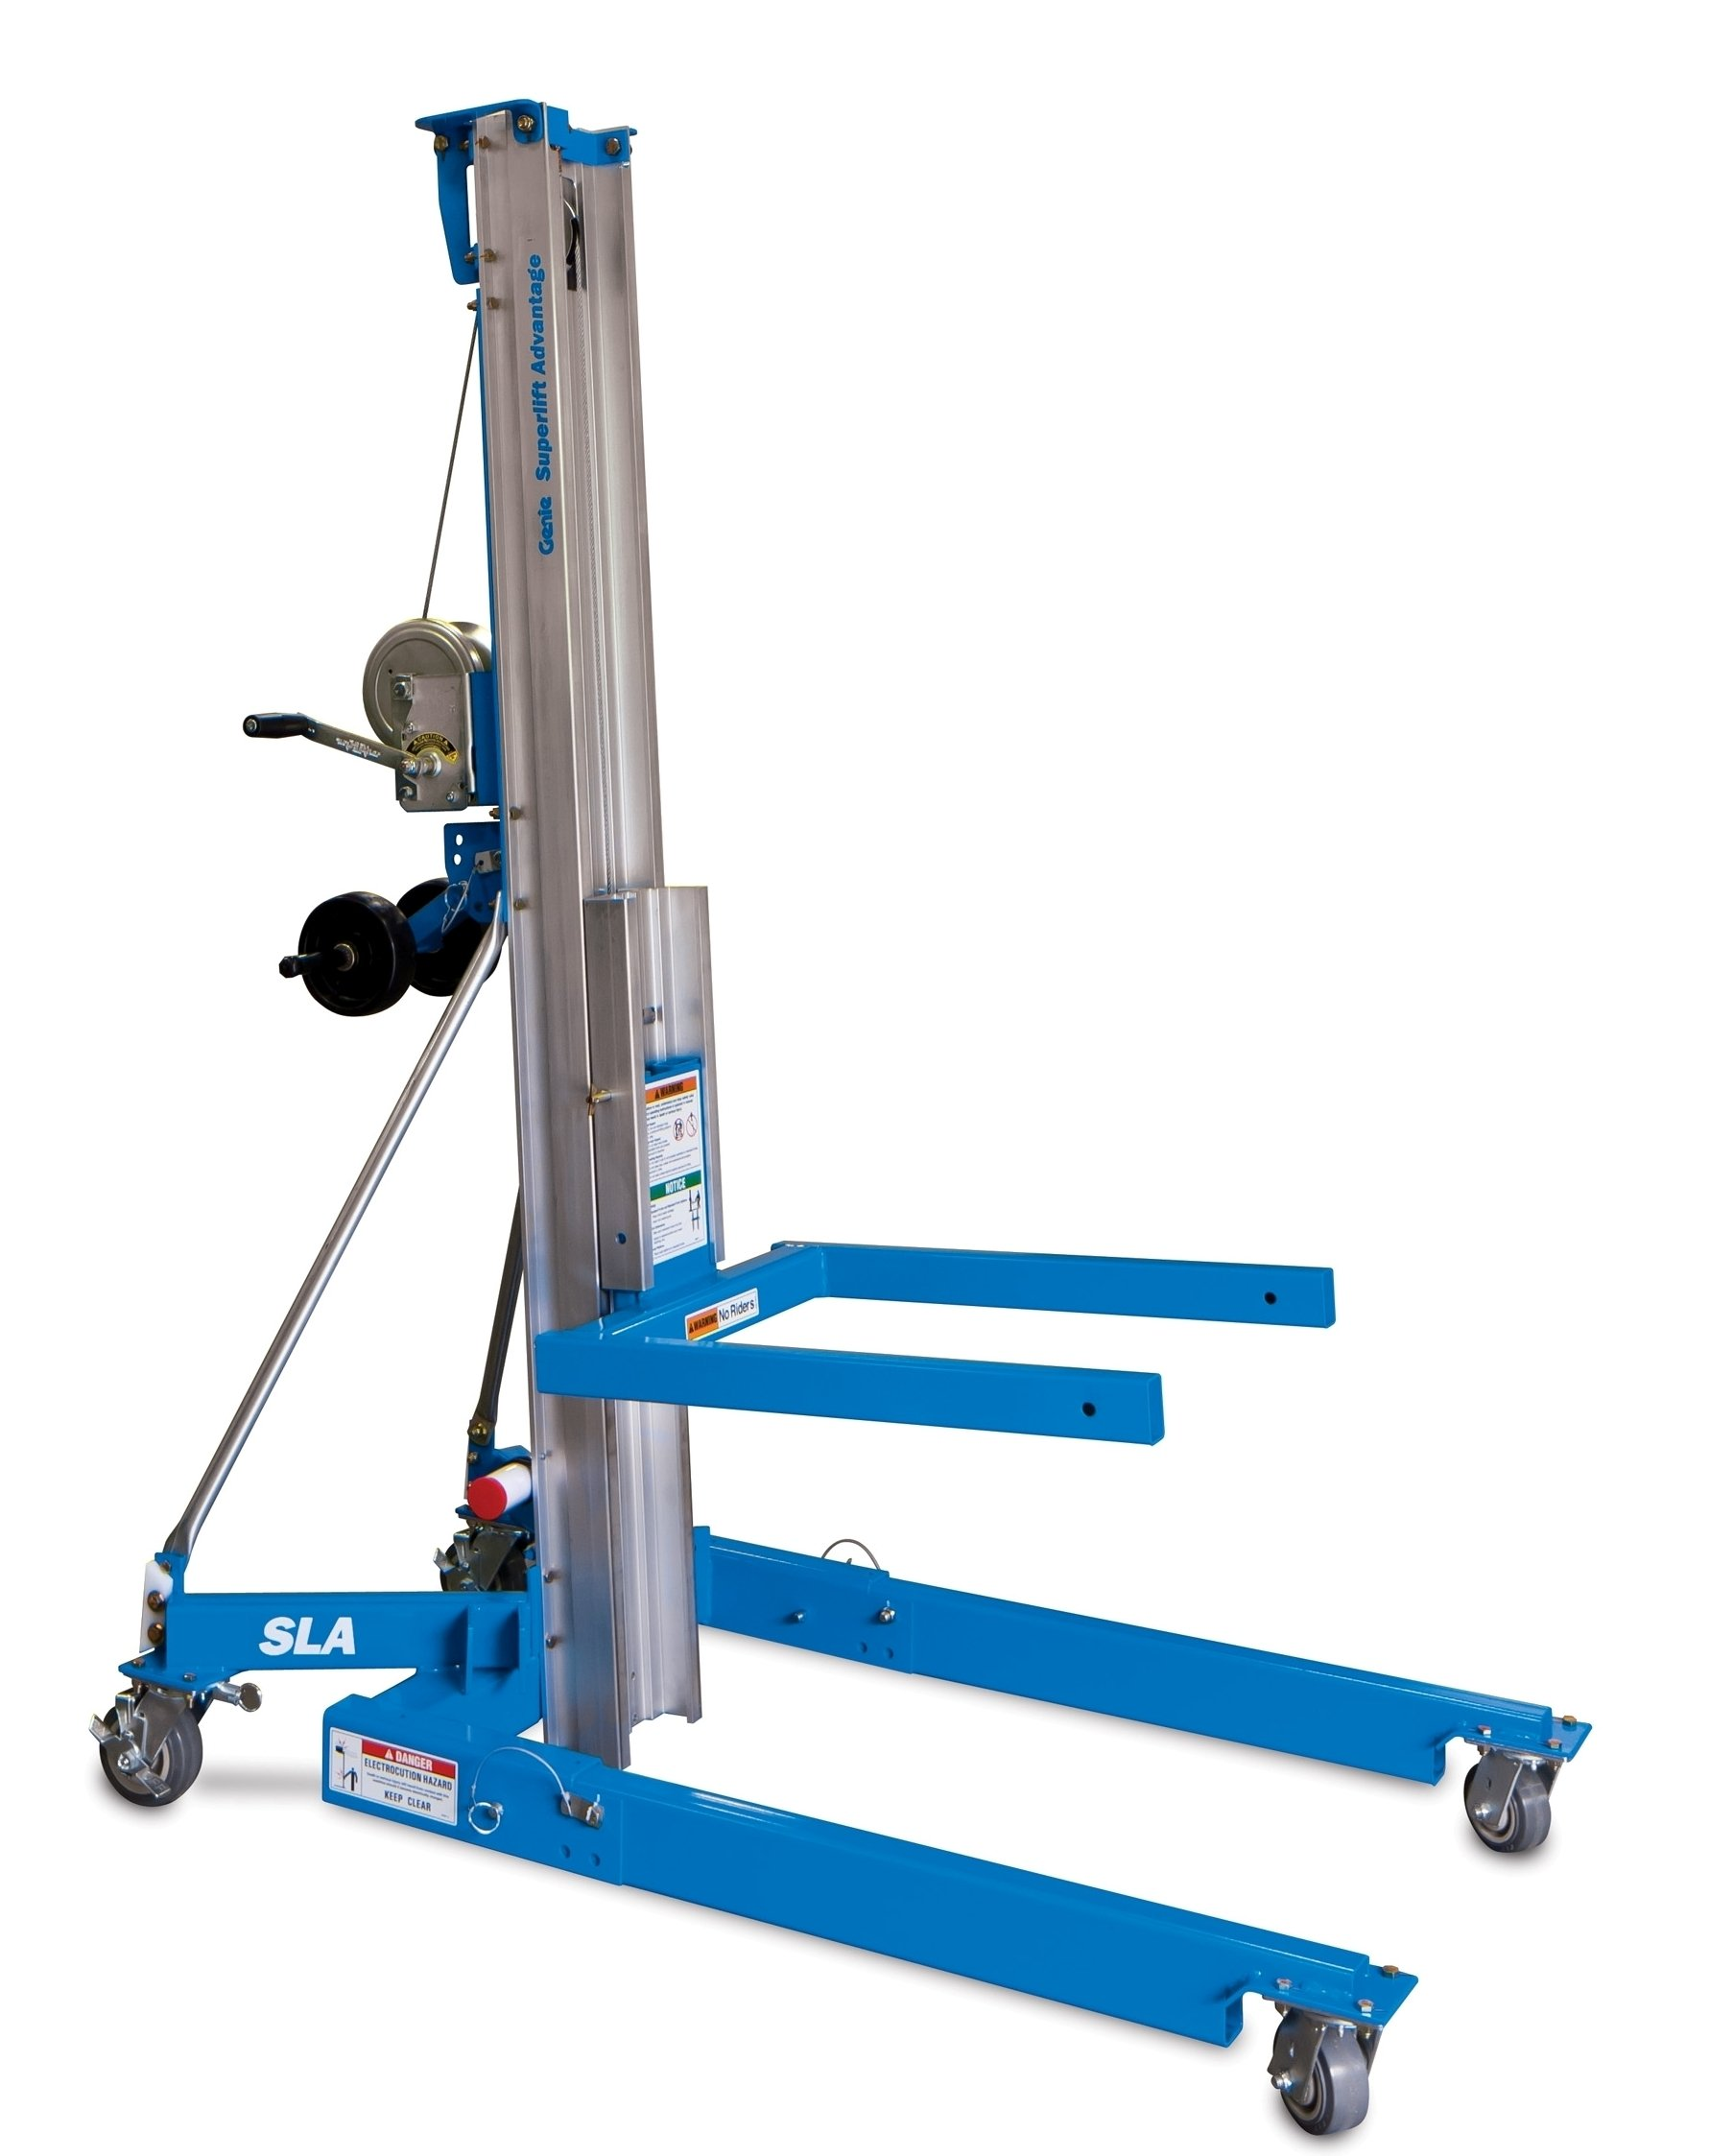 "Genie Super Lift Advantage, SLA- 10, 1000 lbs Load Capacity, Lift Height 11' 5.5"", Load & Transport with Single User"